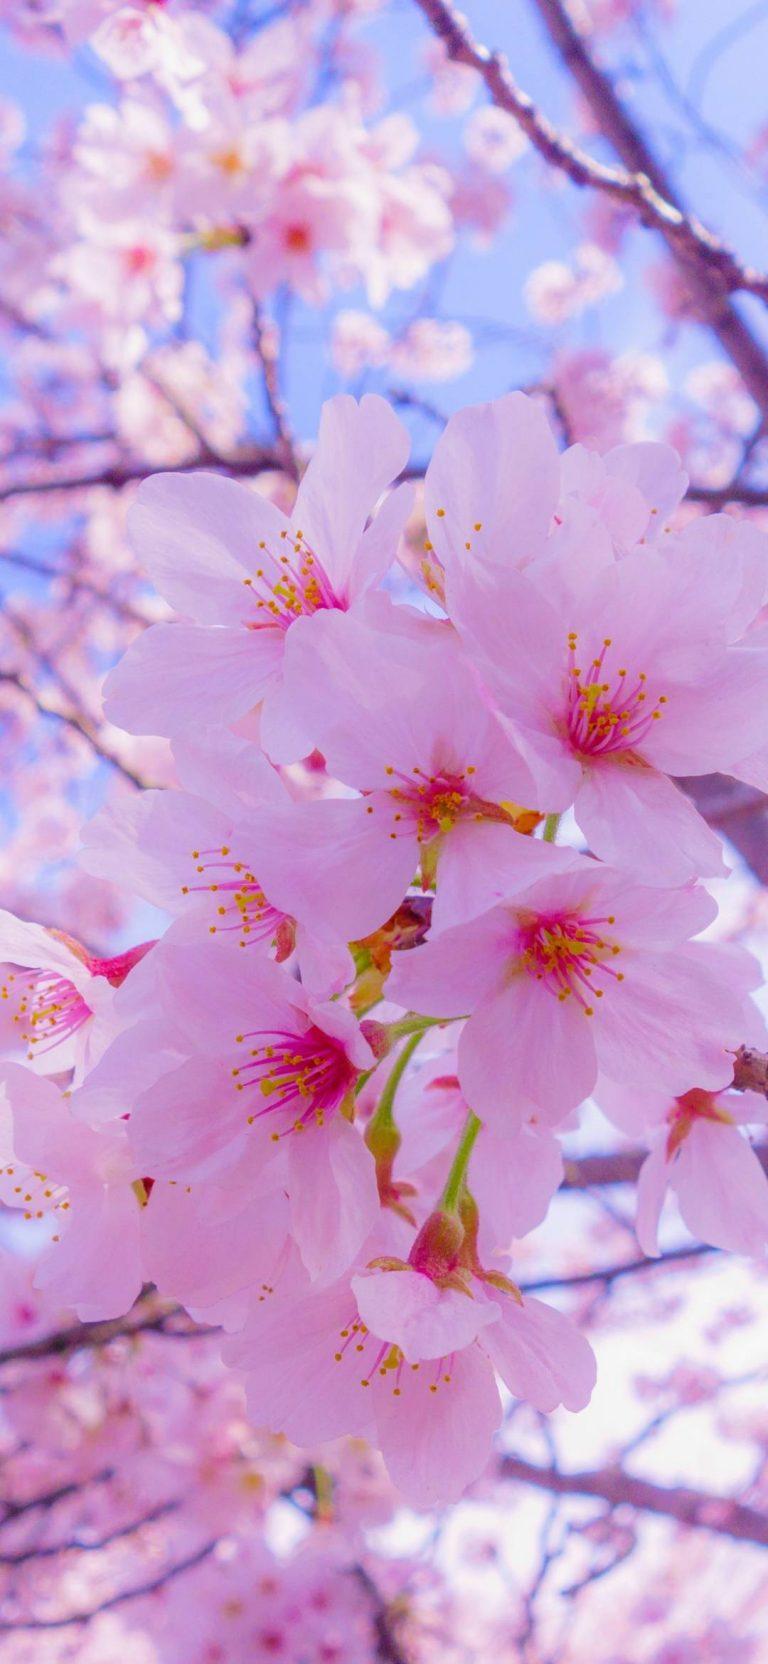 Pin Oleh Savanna Sutton Di Wallpaper Bunga Sakura Estetika Bunga Wallpaper Musim Semi